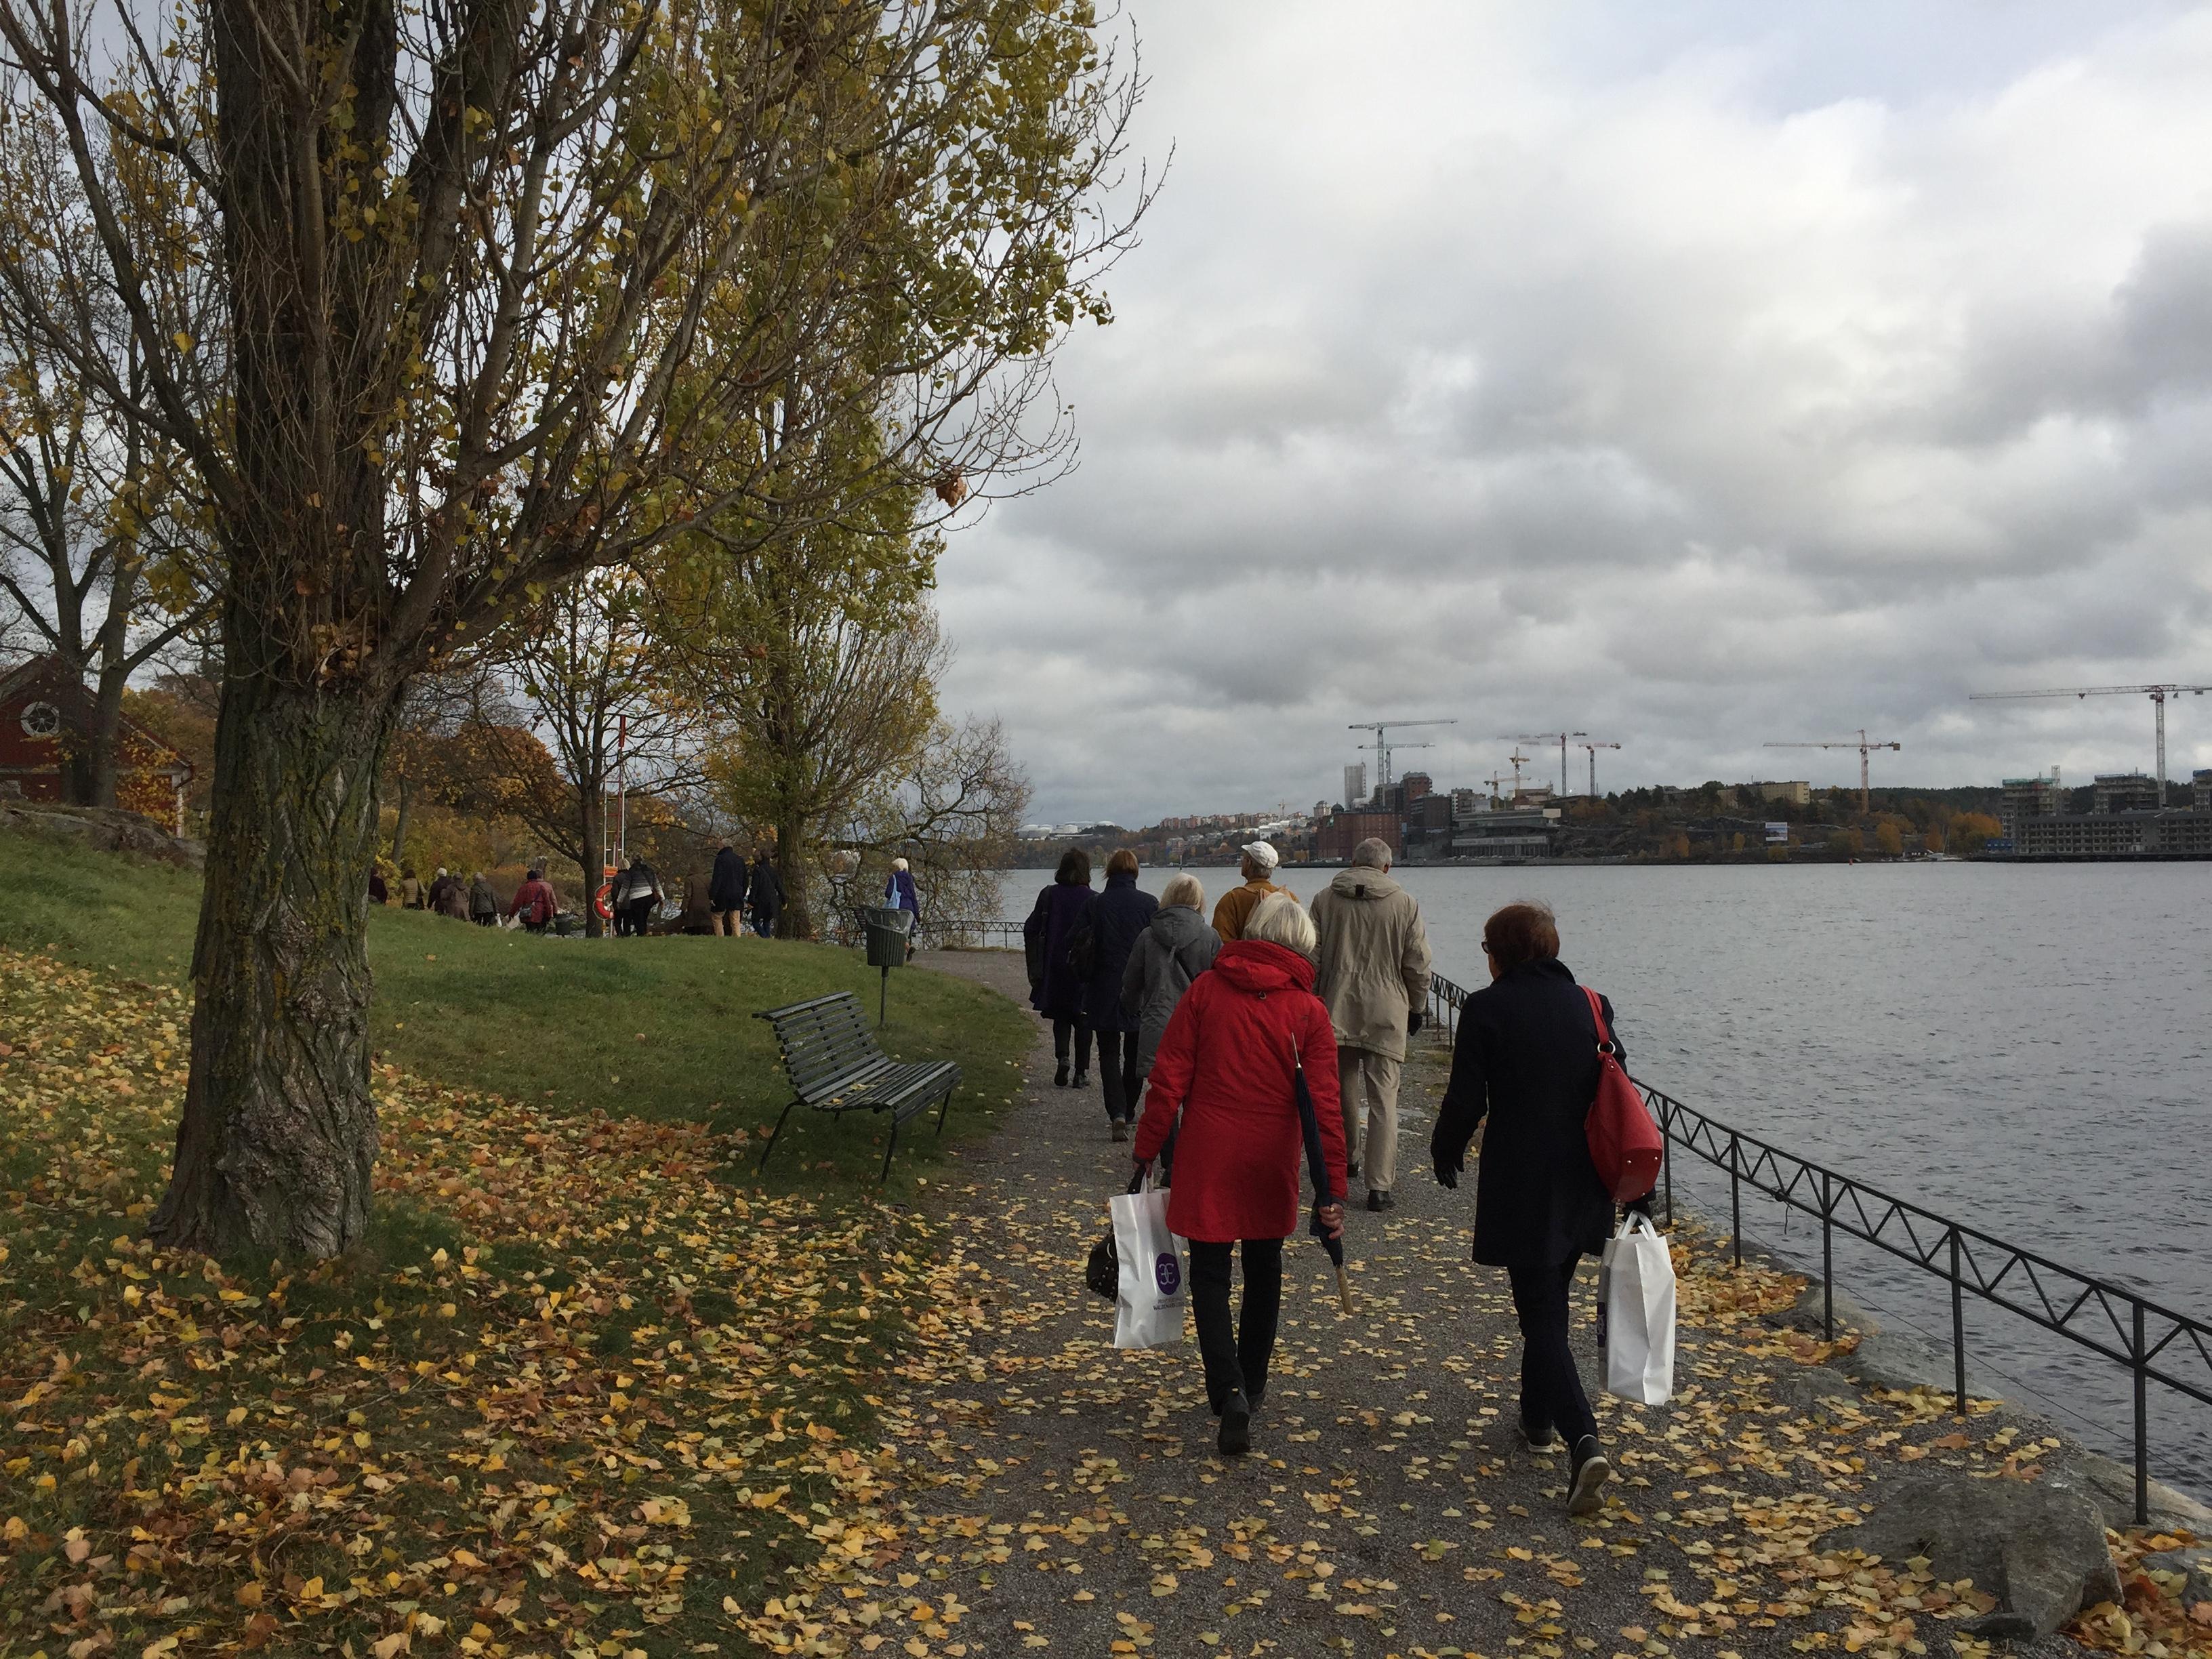 Onsdagsklubb Busstur till offentlig konst i Norrköping